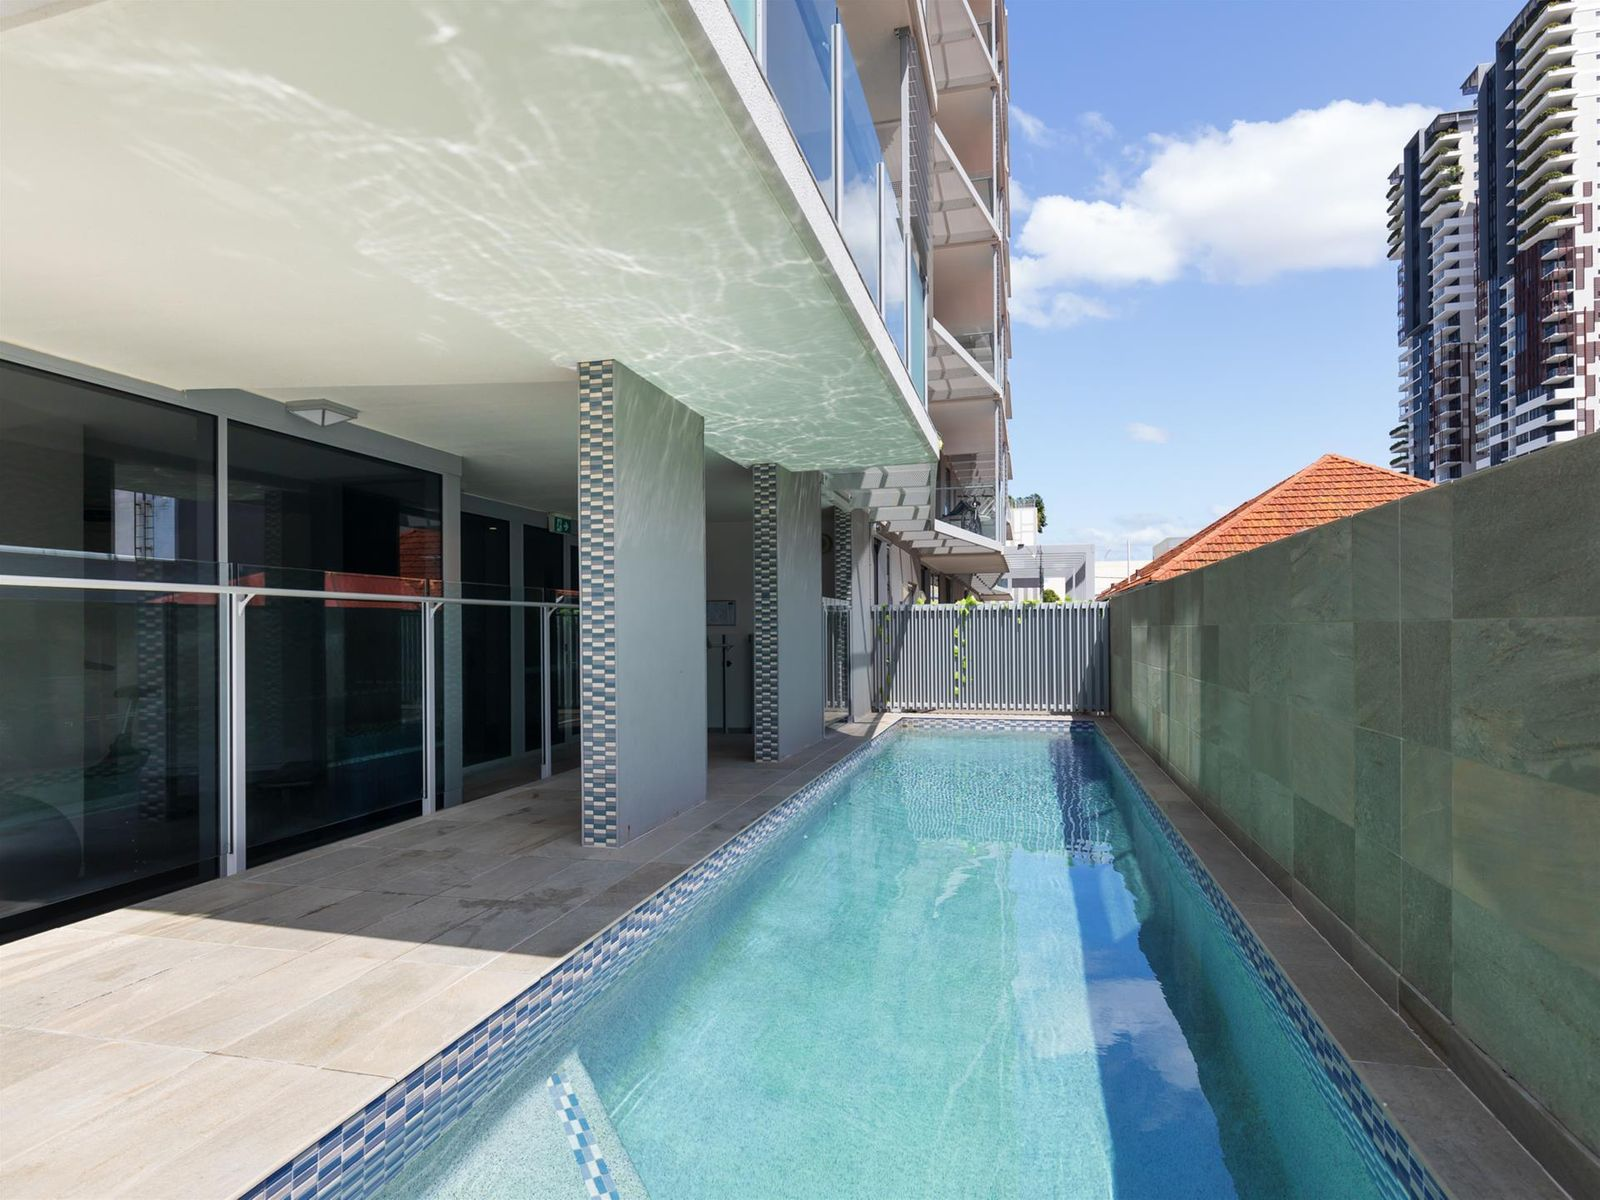 607/35 Peel Street, South Brisbane, QLD 4101